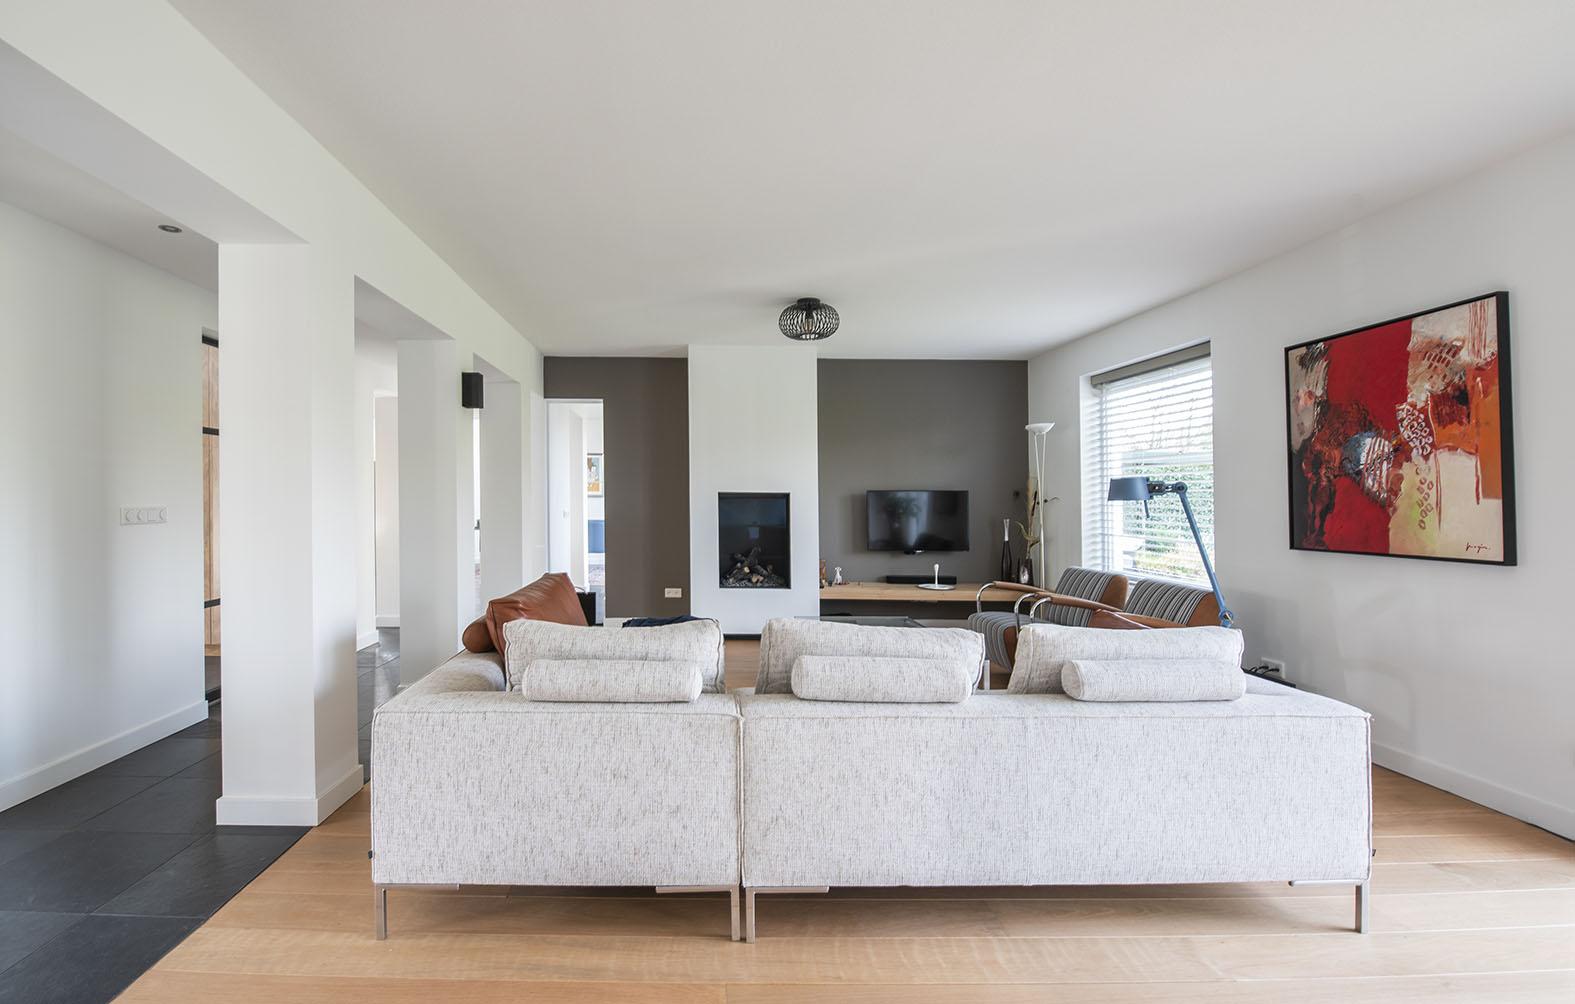 Woonkamer interieuradvies Den Bosch engelen huiskamer stylen design on stock villa vrijstaande woning stylen